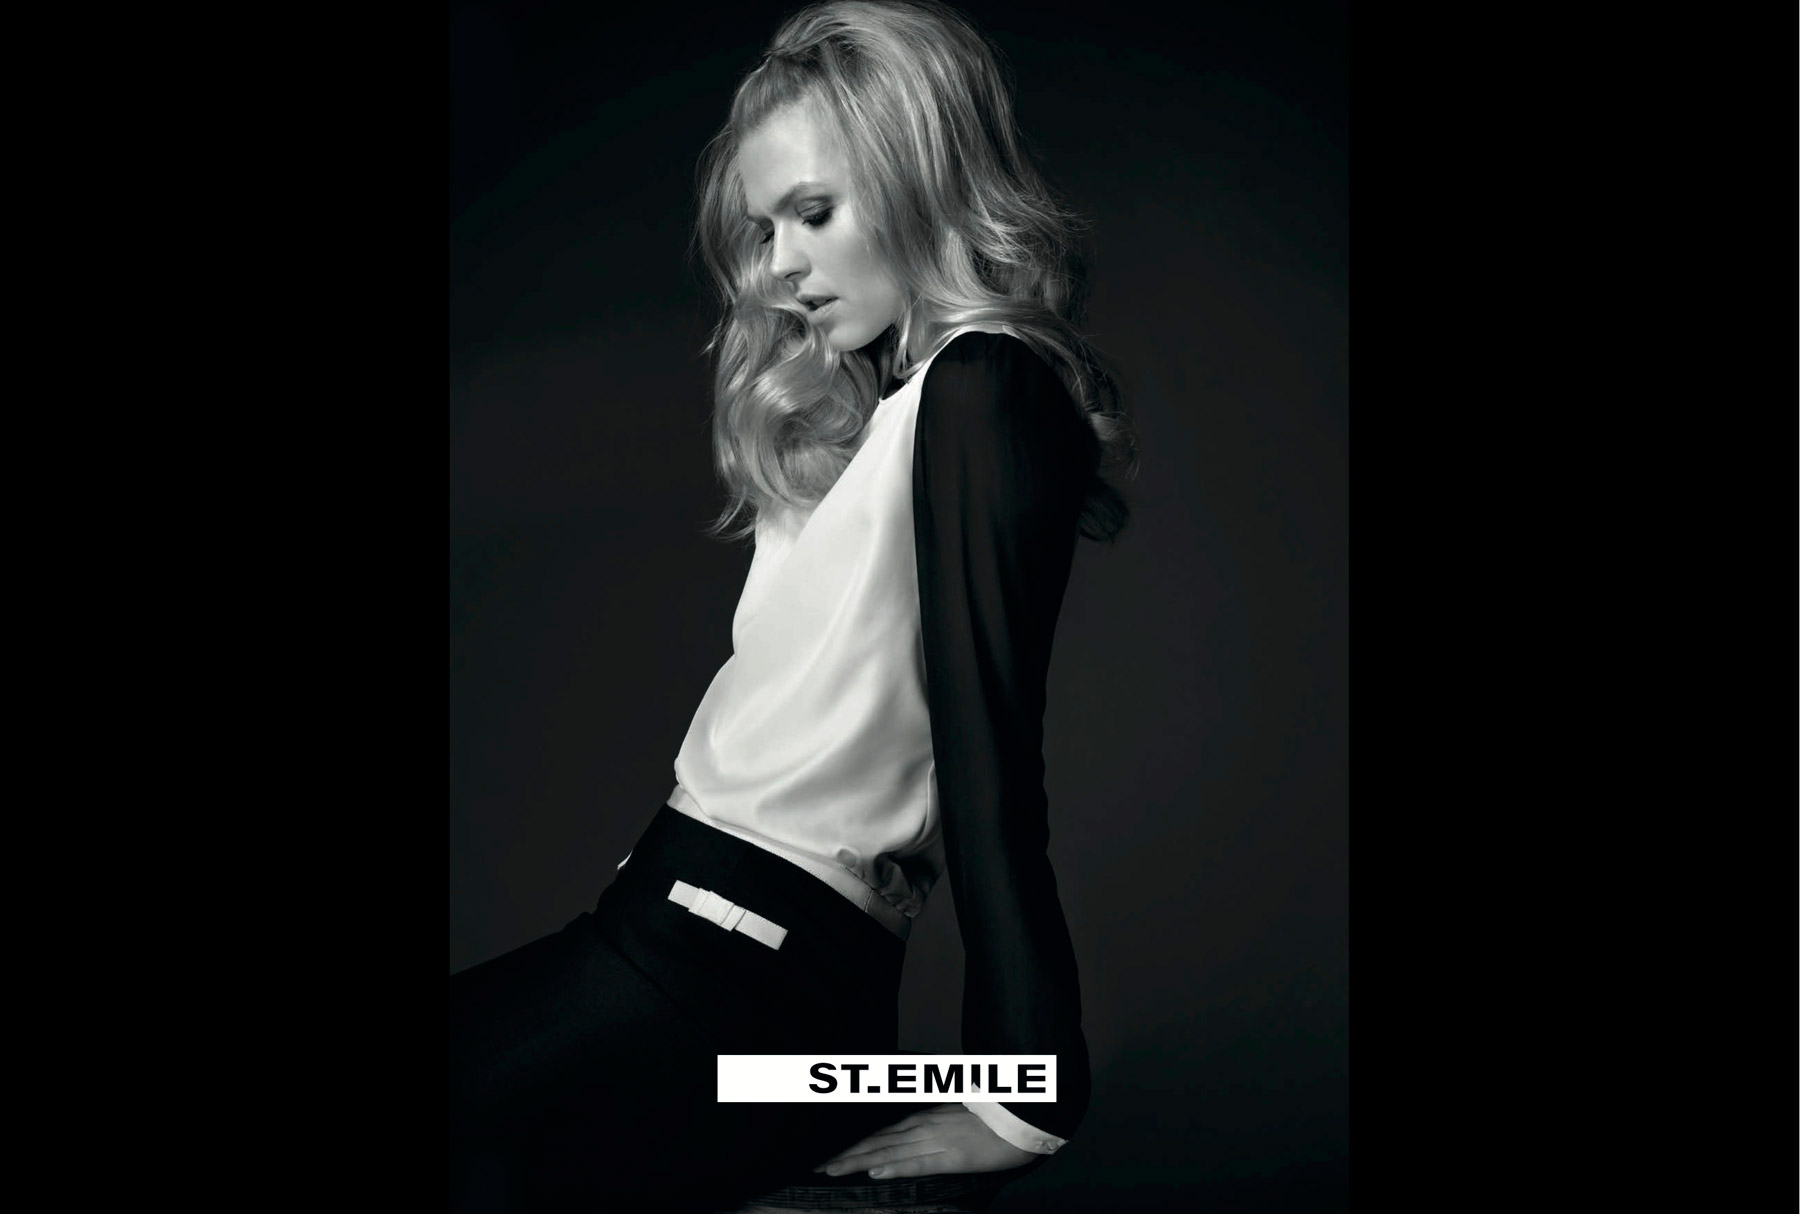 st-emile-002.jpg